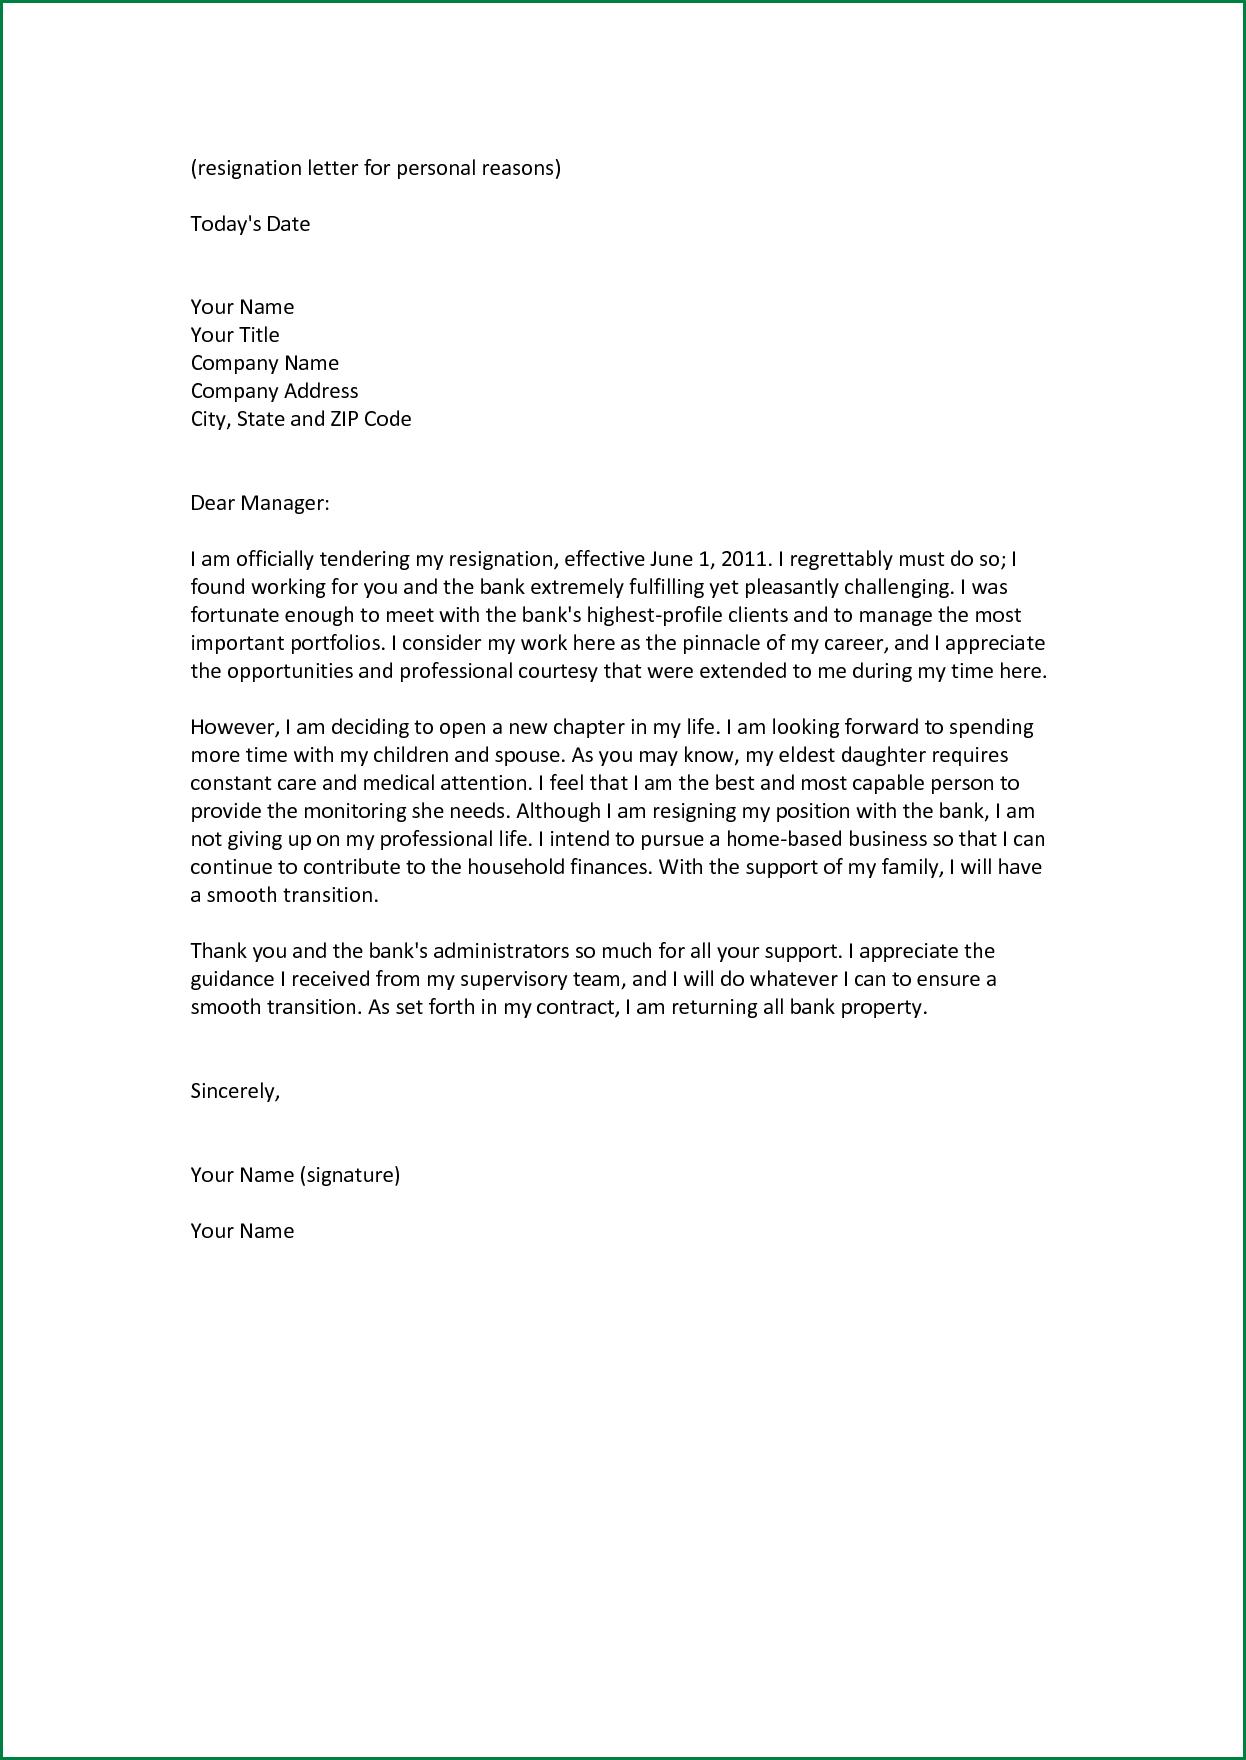 pattern of resignation letter